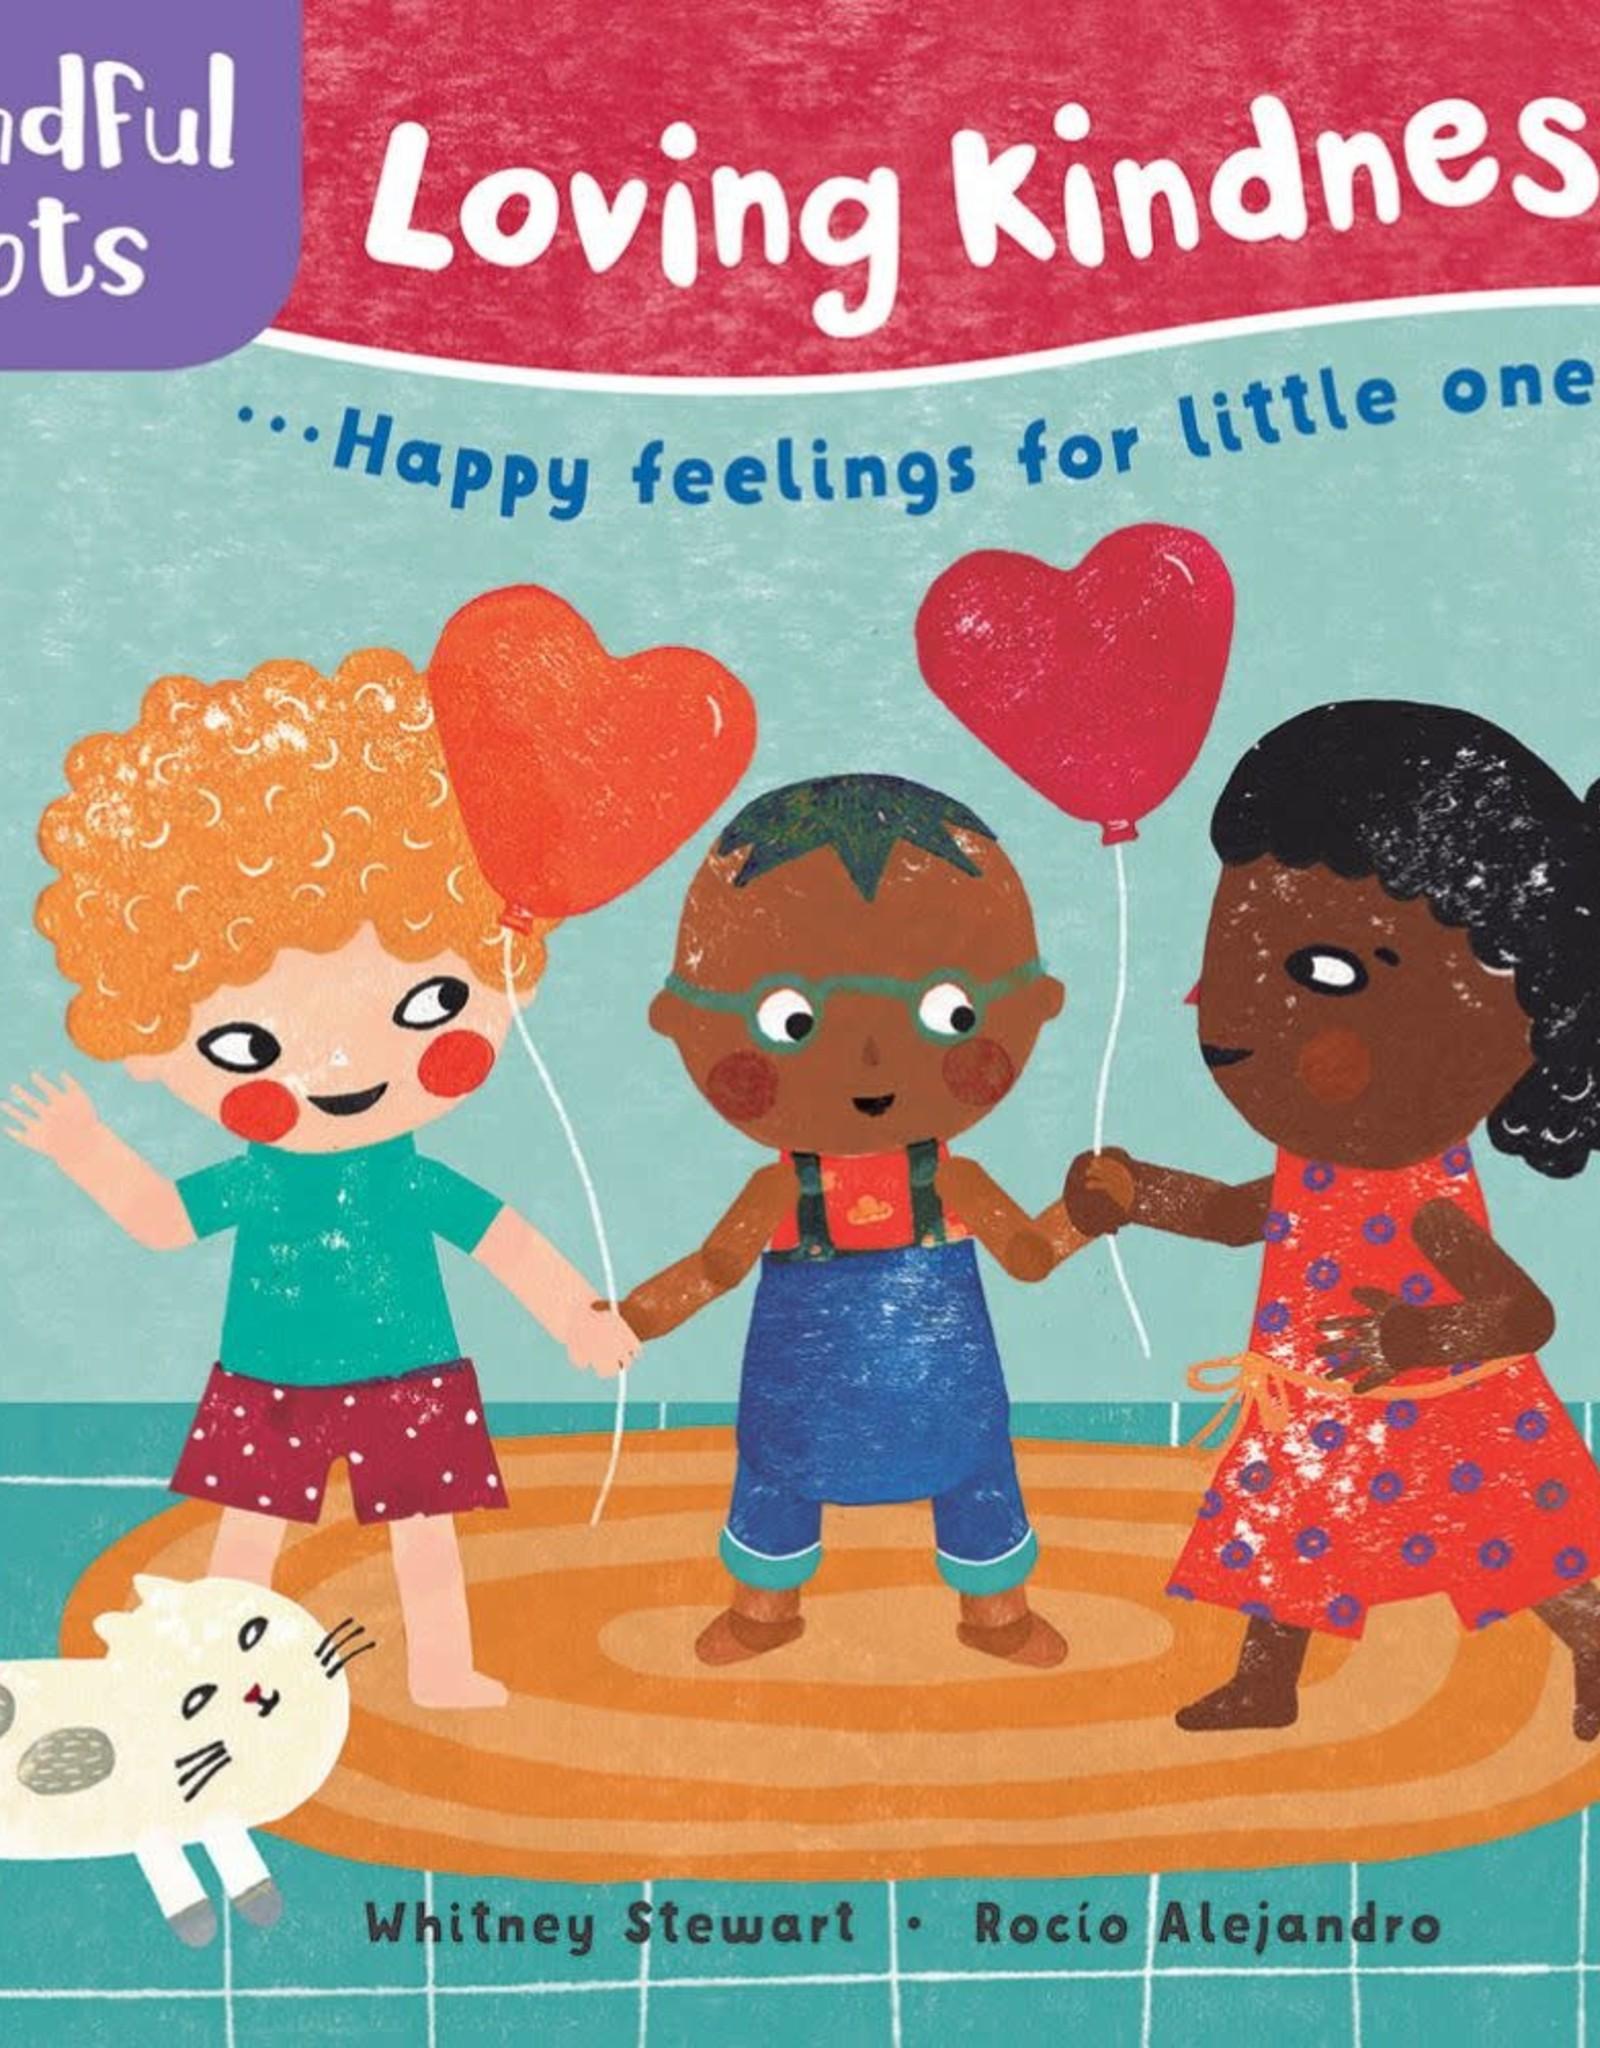 Barefoot Books Mindful Tots: Loving Kindness